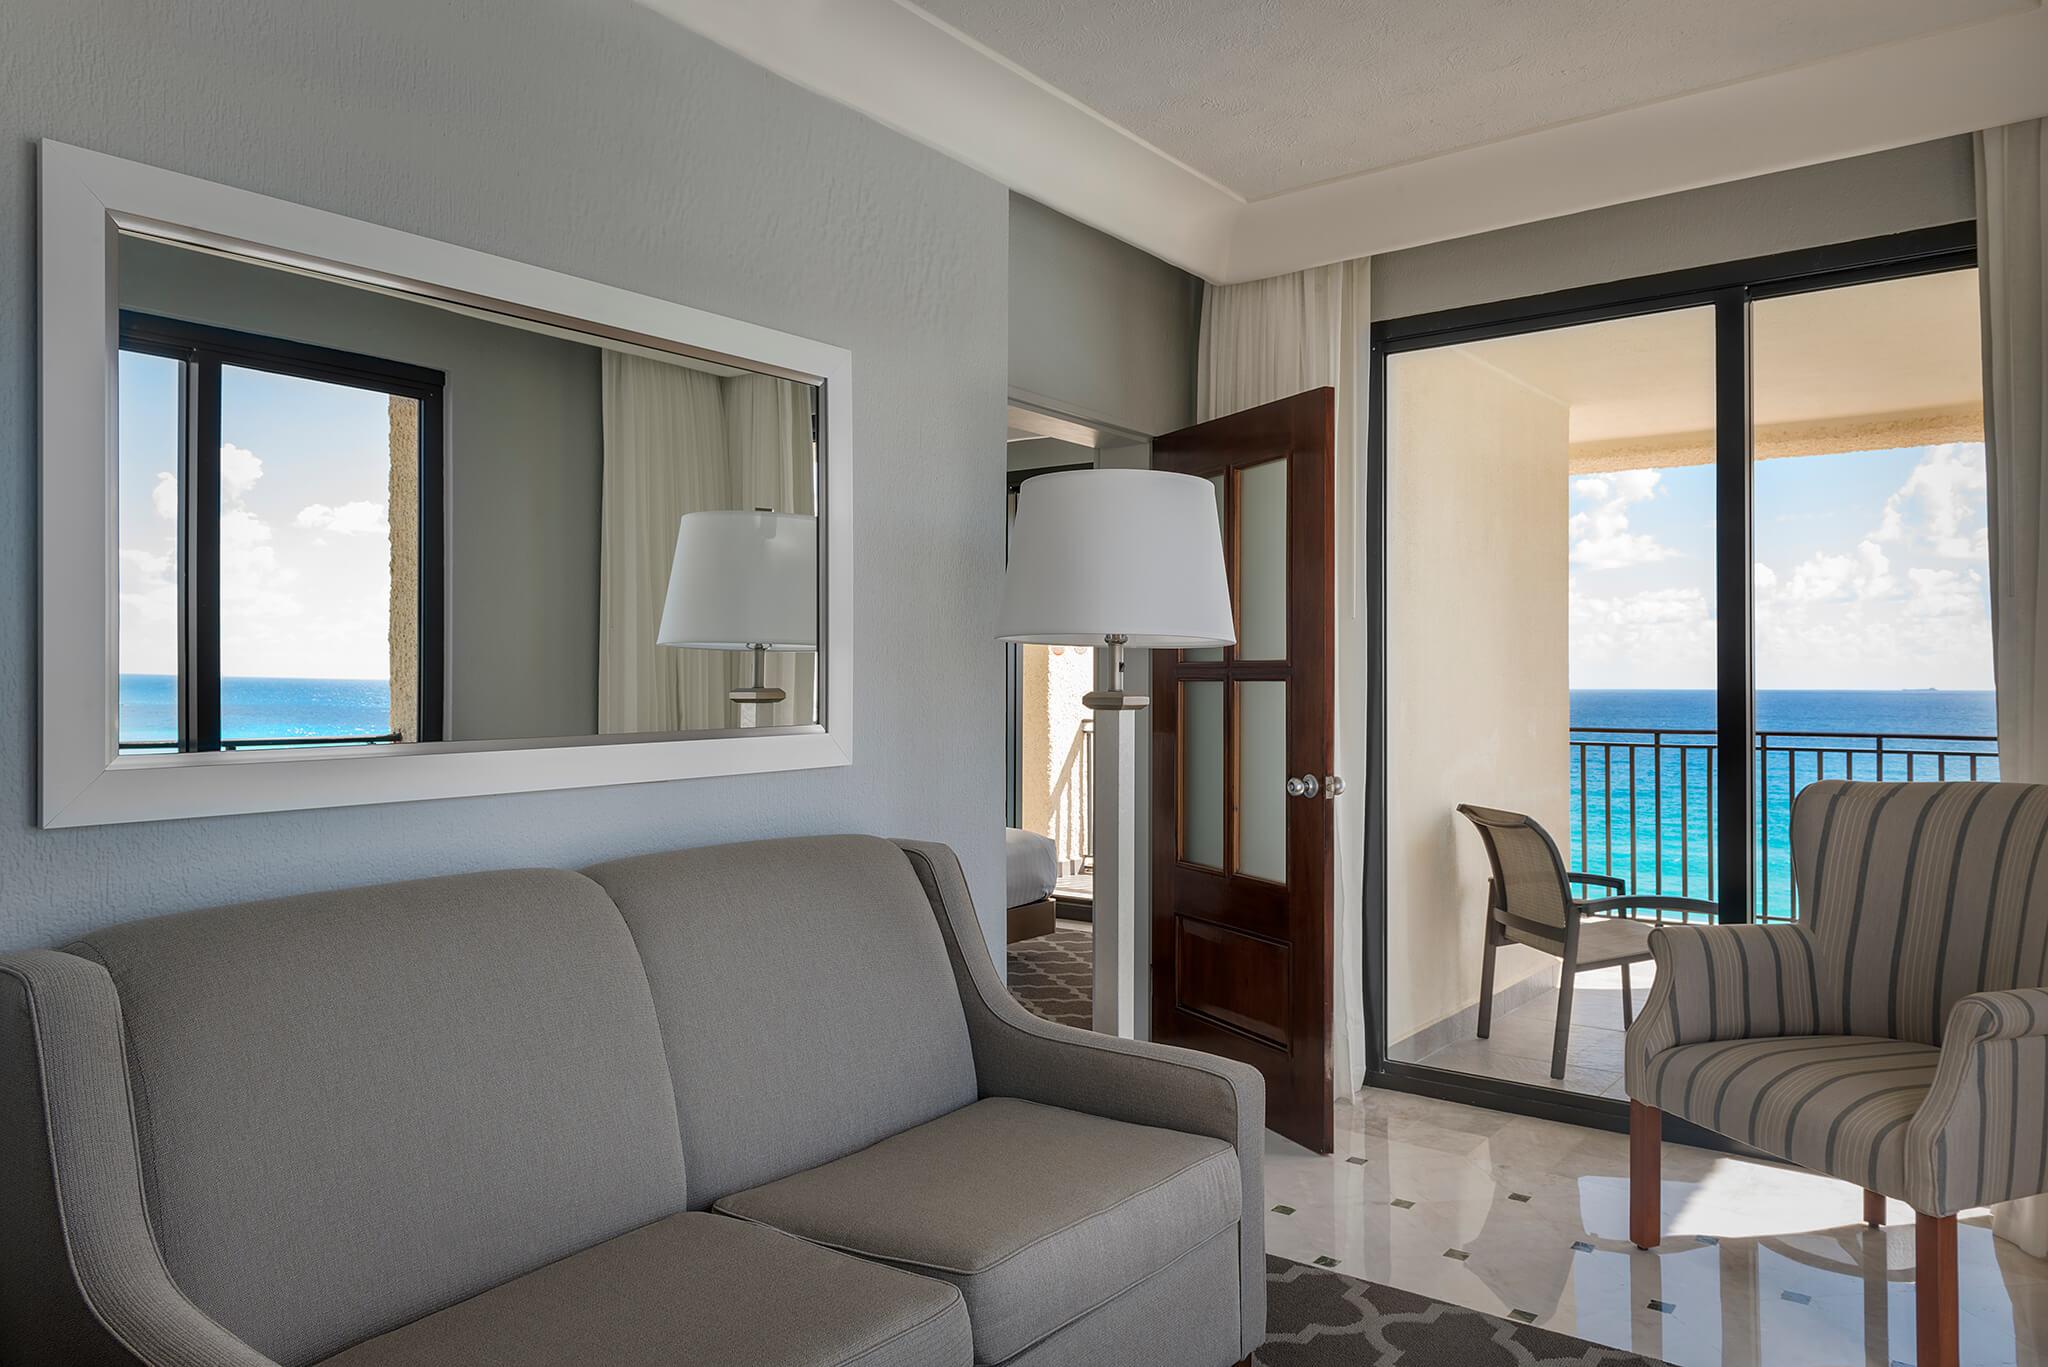 Marriott Caribbean Suite King